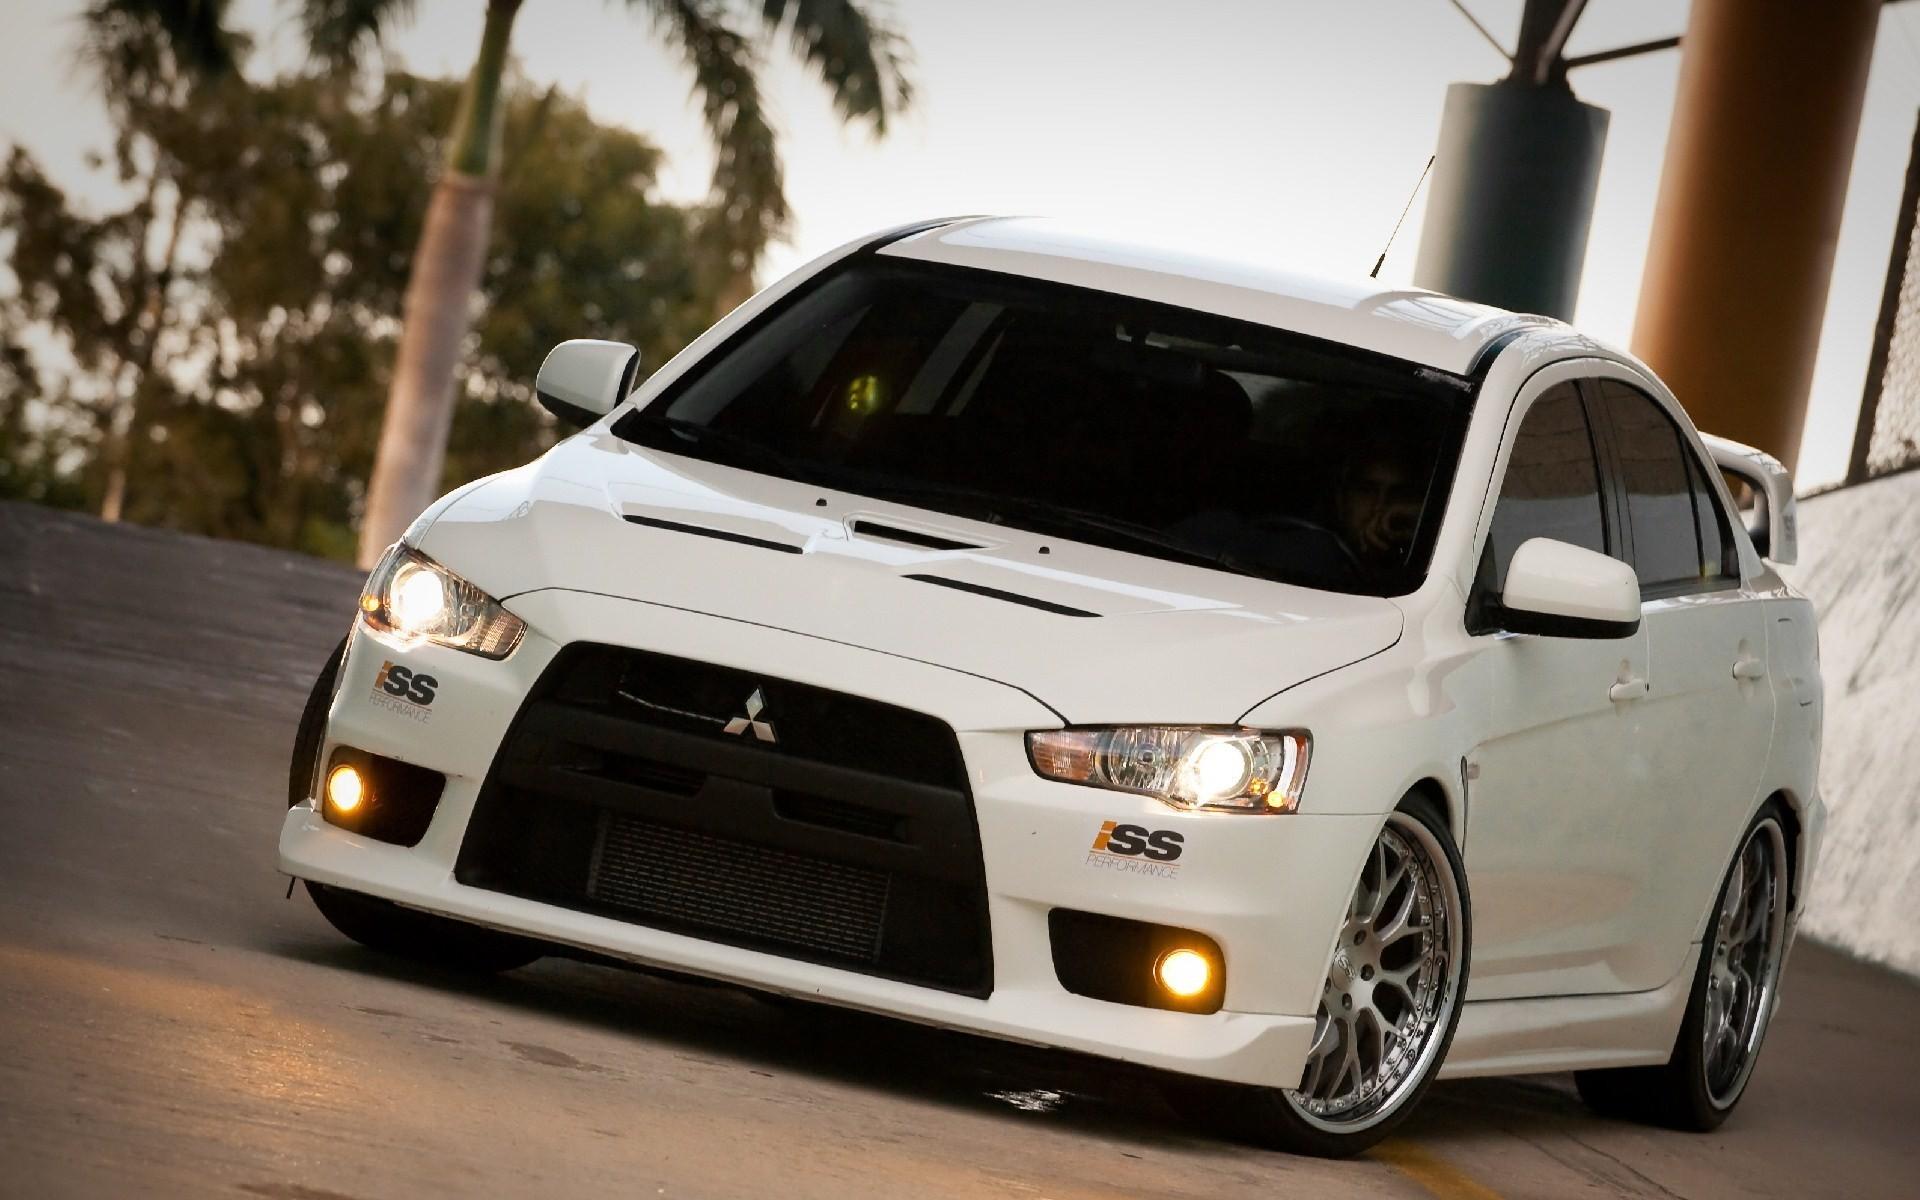 wallpaper : sports car, mitsubishi lancer, mitsubishi lancer evo